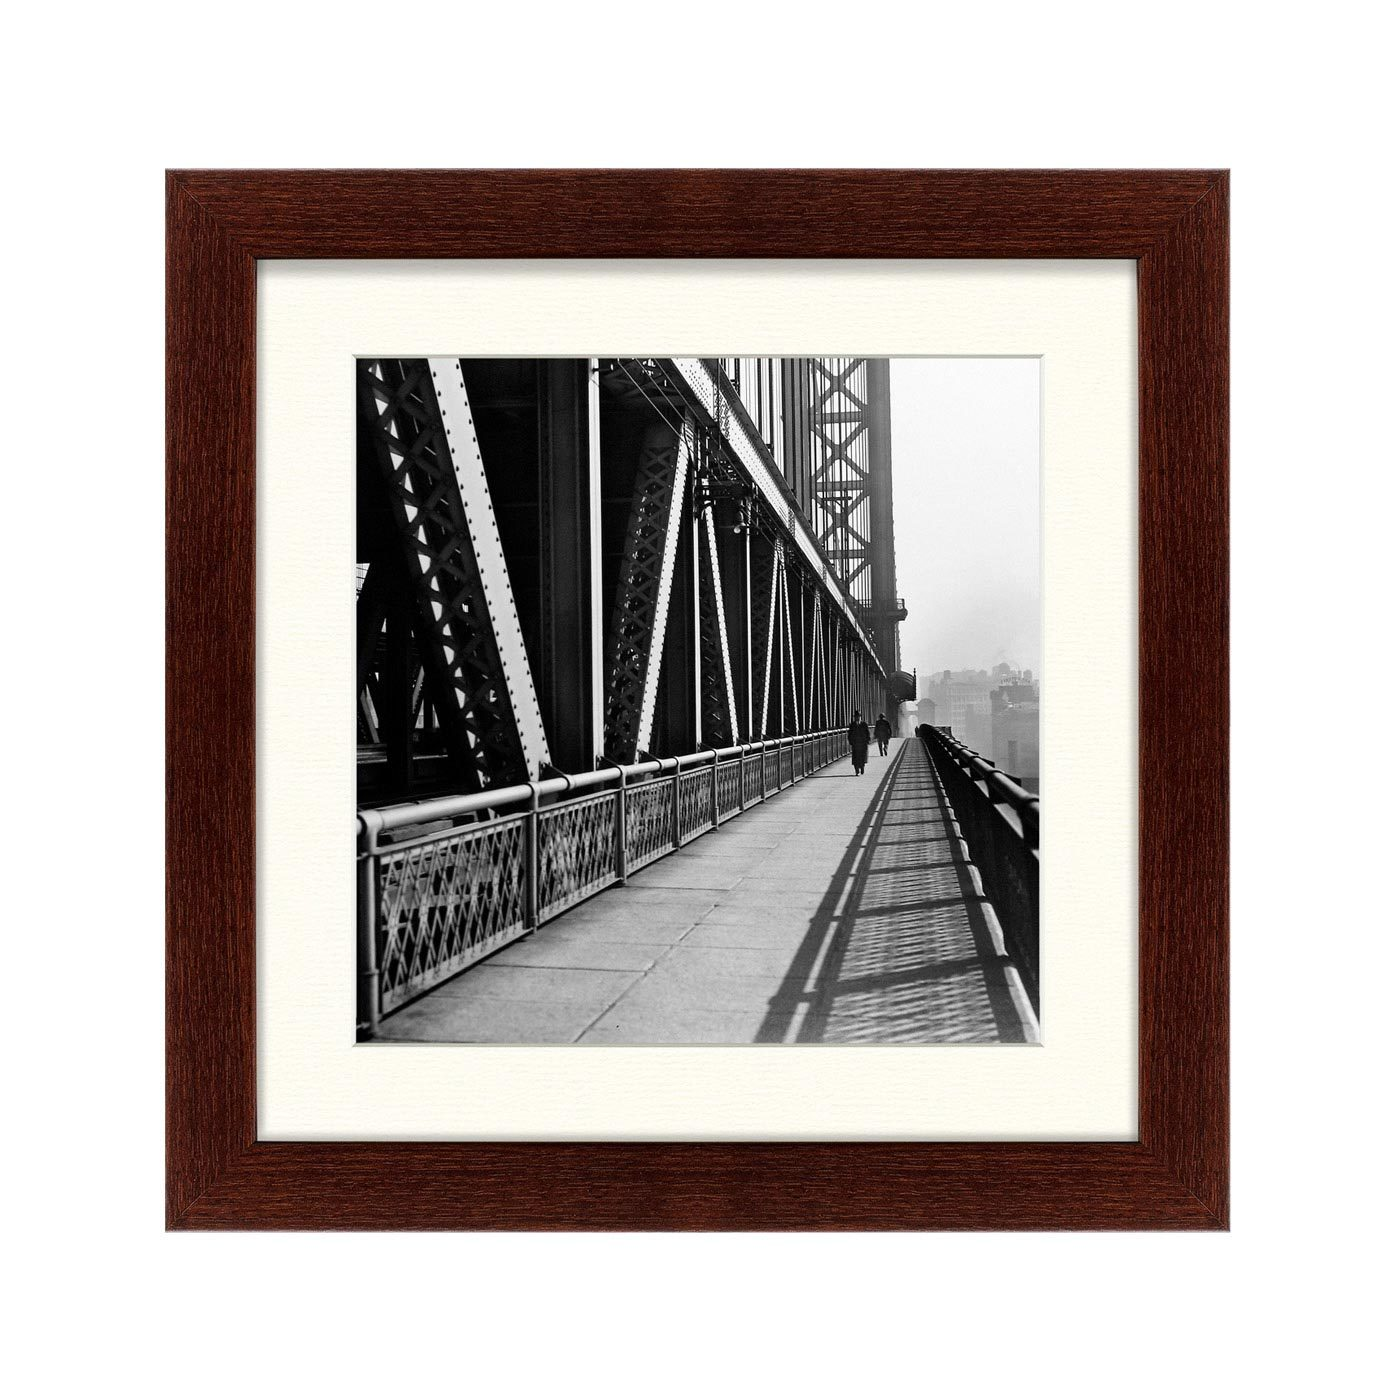 {} Картины в Квартиру Картина Манхэттенский Мост (35х35 см) картины в квартиру картина опасные домохозяйки 2 35х35 см